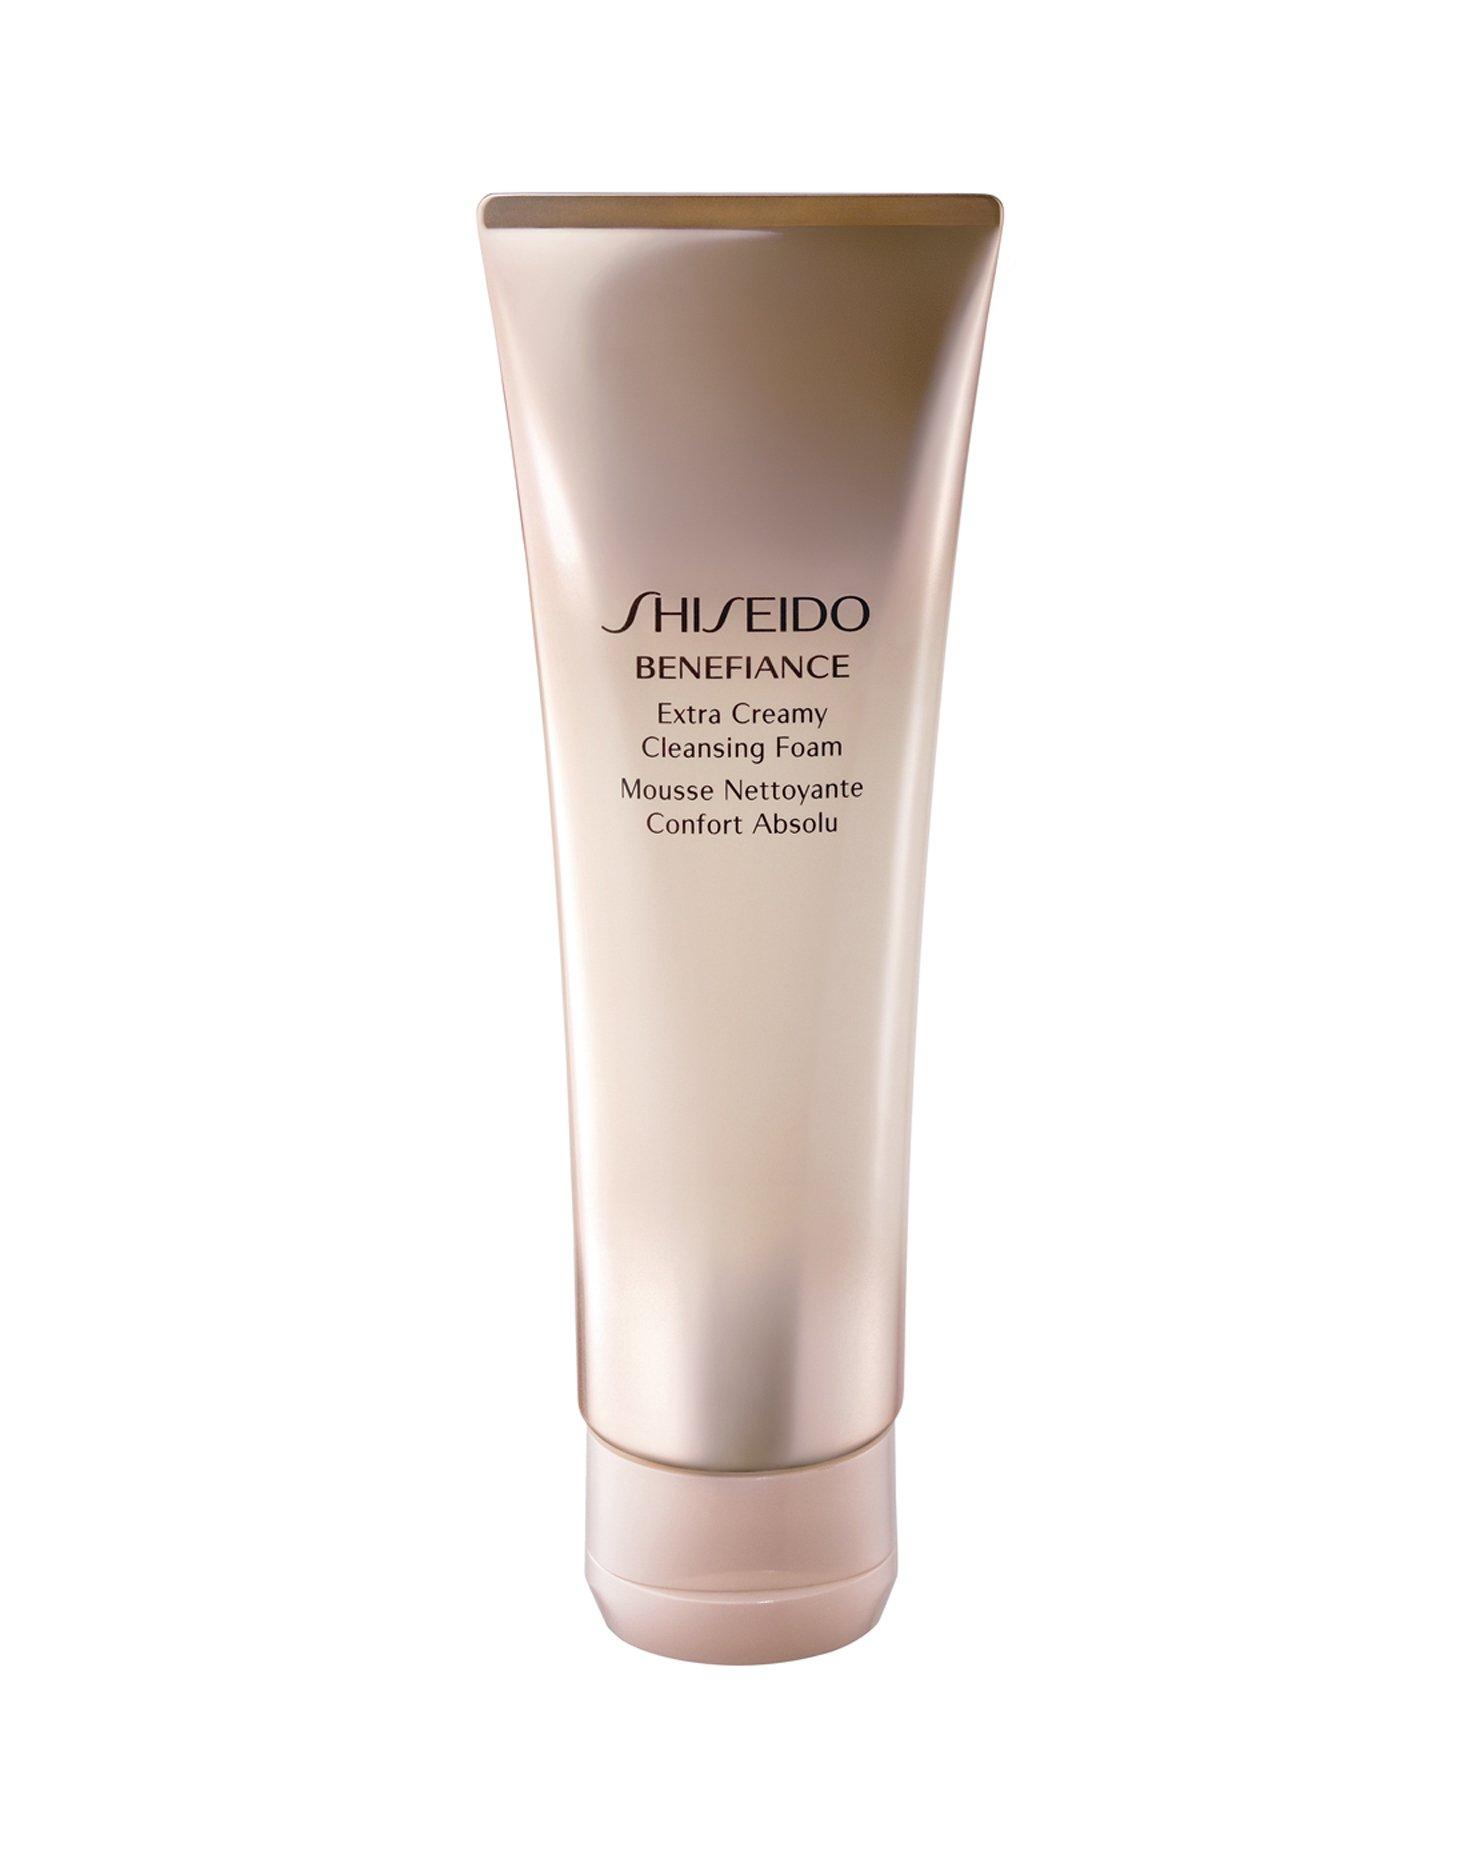 Shiseido Benefiance Extra Creamy Cleansing Foam, 4.4 oz